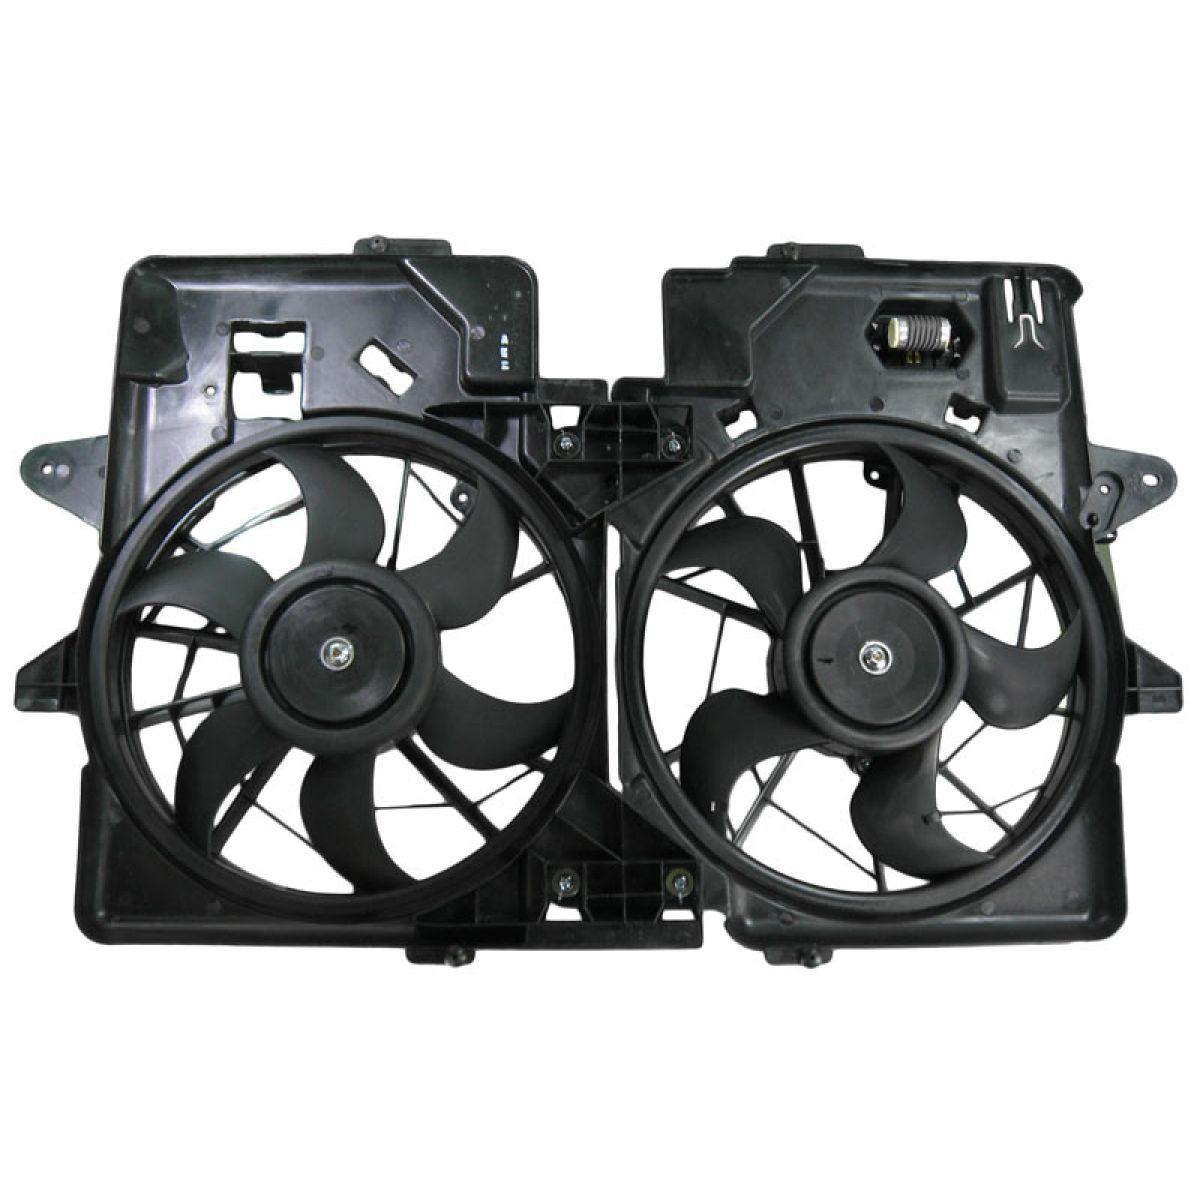 Ford Escape 3.0L V6 01-04 Mazda Tribute 01-06 Radiator A//C AC Cooling Fan